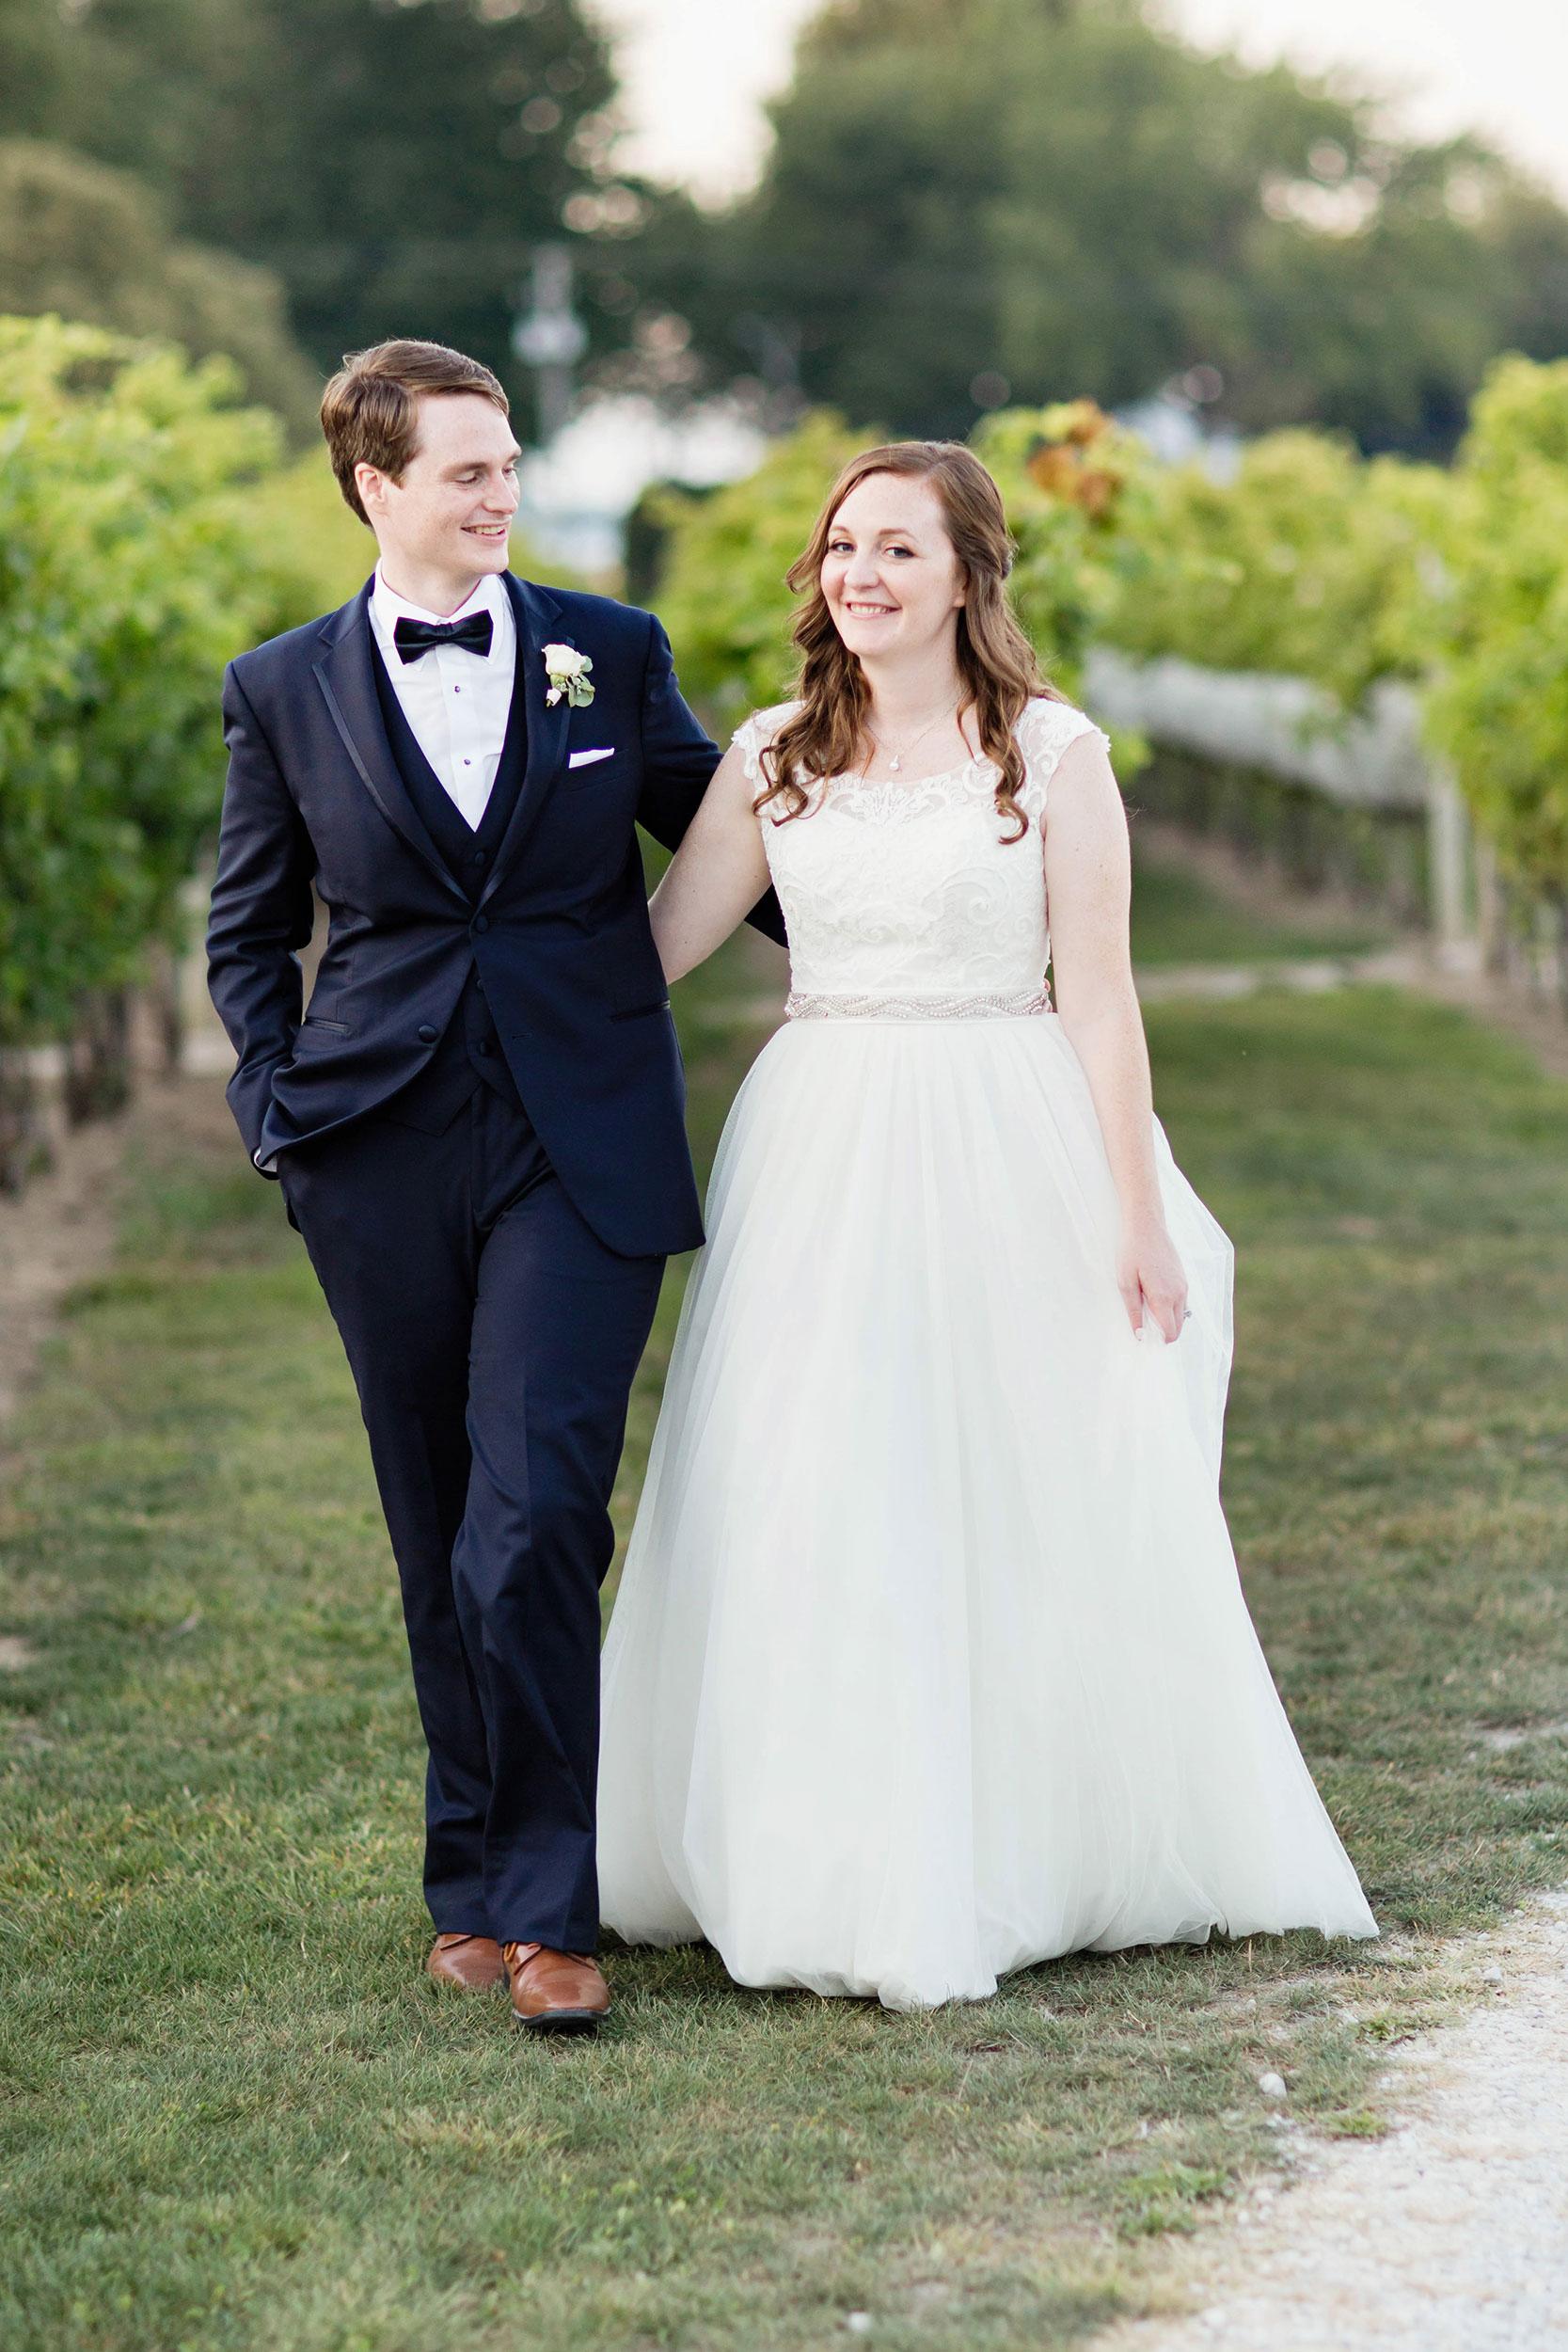 stylish-wedding-photography-windsor-toronto-ontario-wedding-photographer-winery-eryn-shea-photography-47.JPG